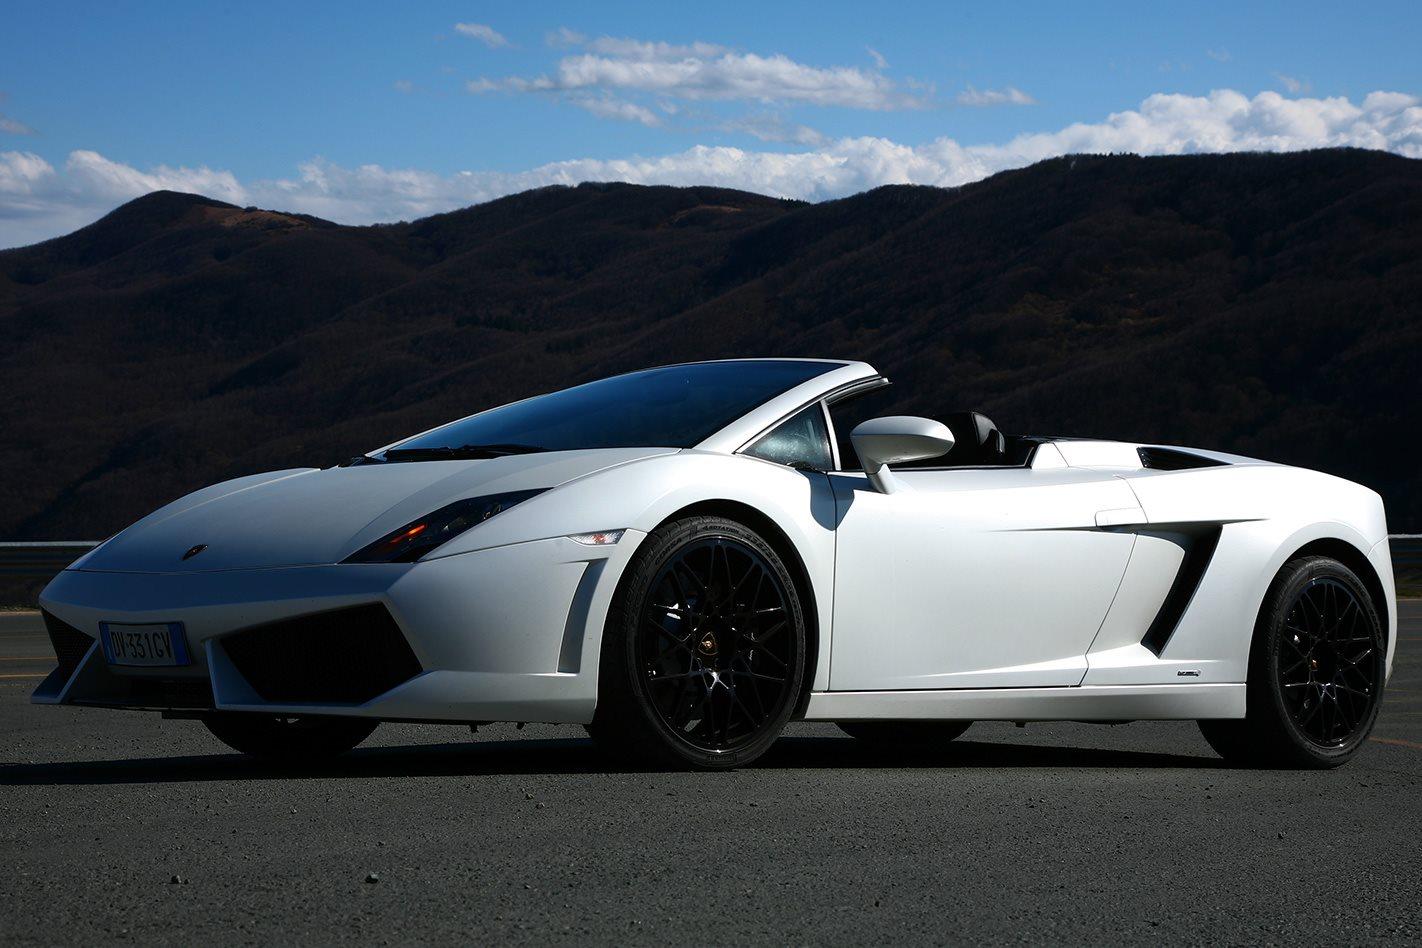 Lamborghini Gallardo Spyder front